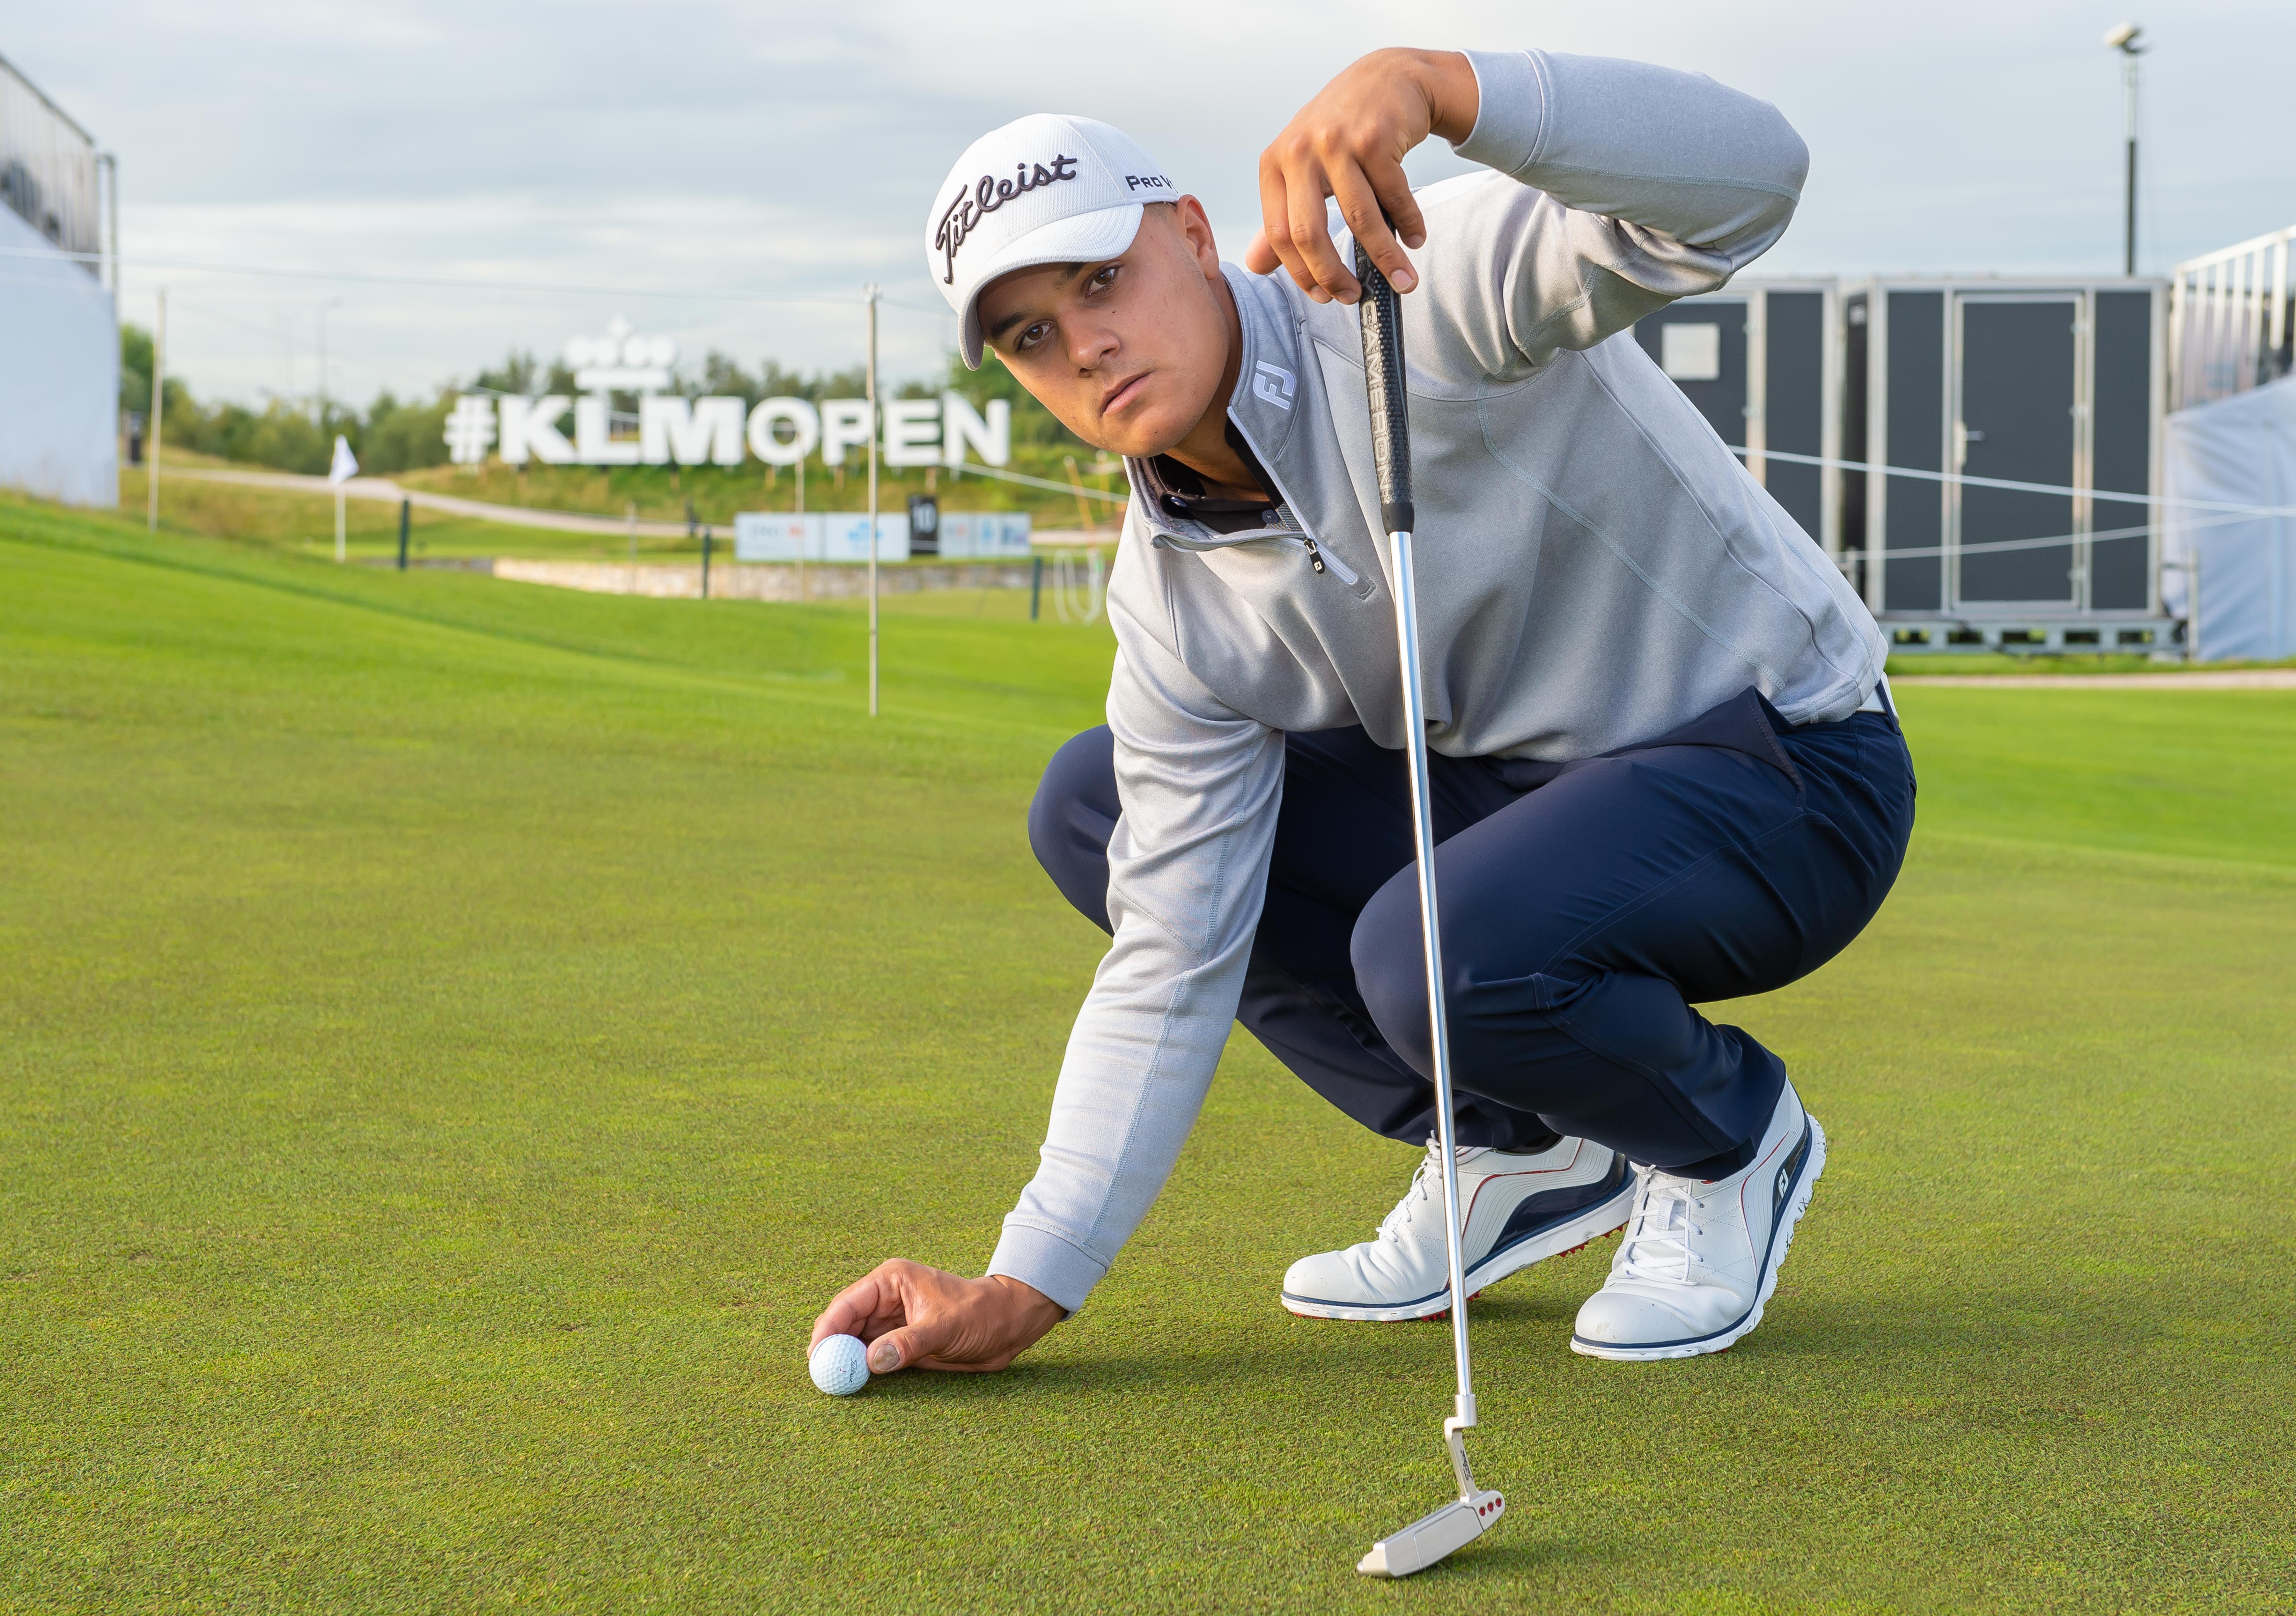 Golfer Mike Toorop is 'het' opeens helemaal kwijt in Sevilla en valt op slotdag van gedeelde koppositie terug naar gedeelde 38e plek